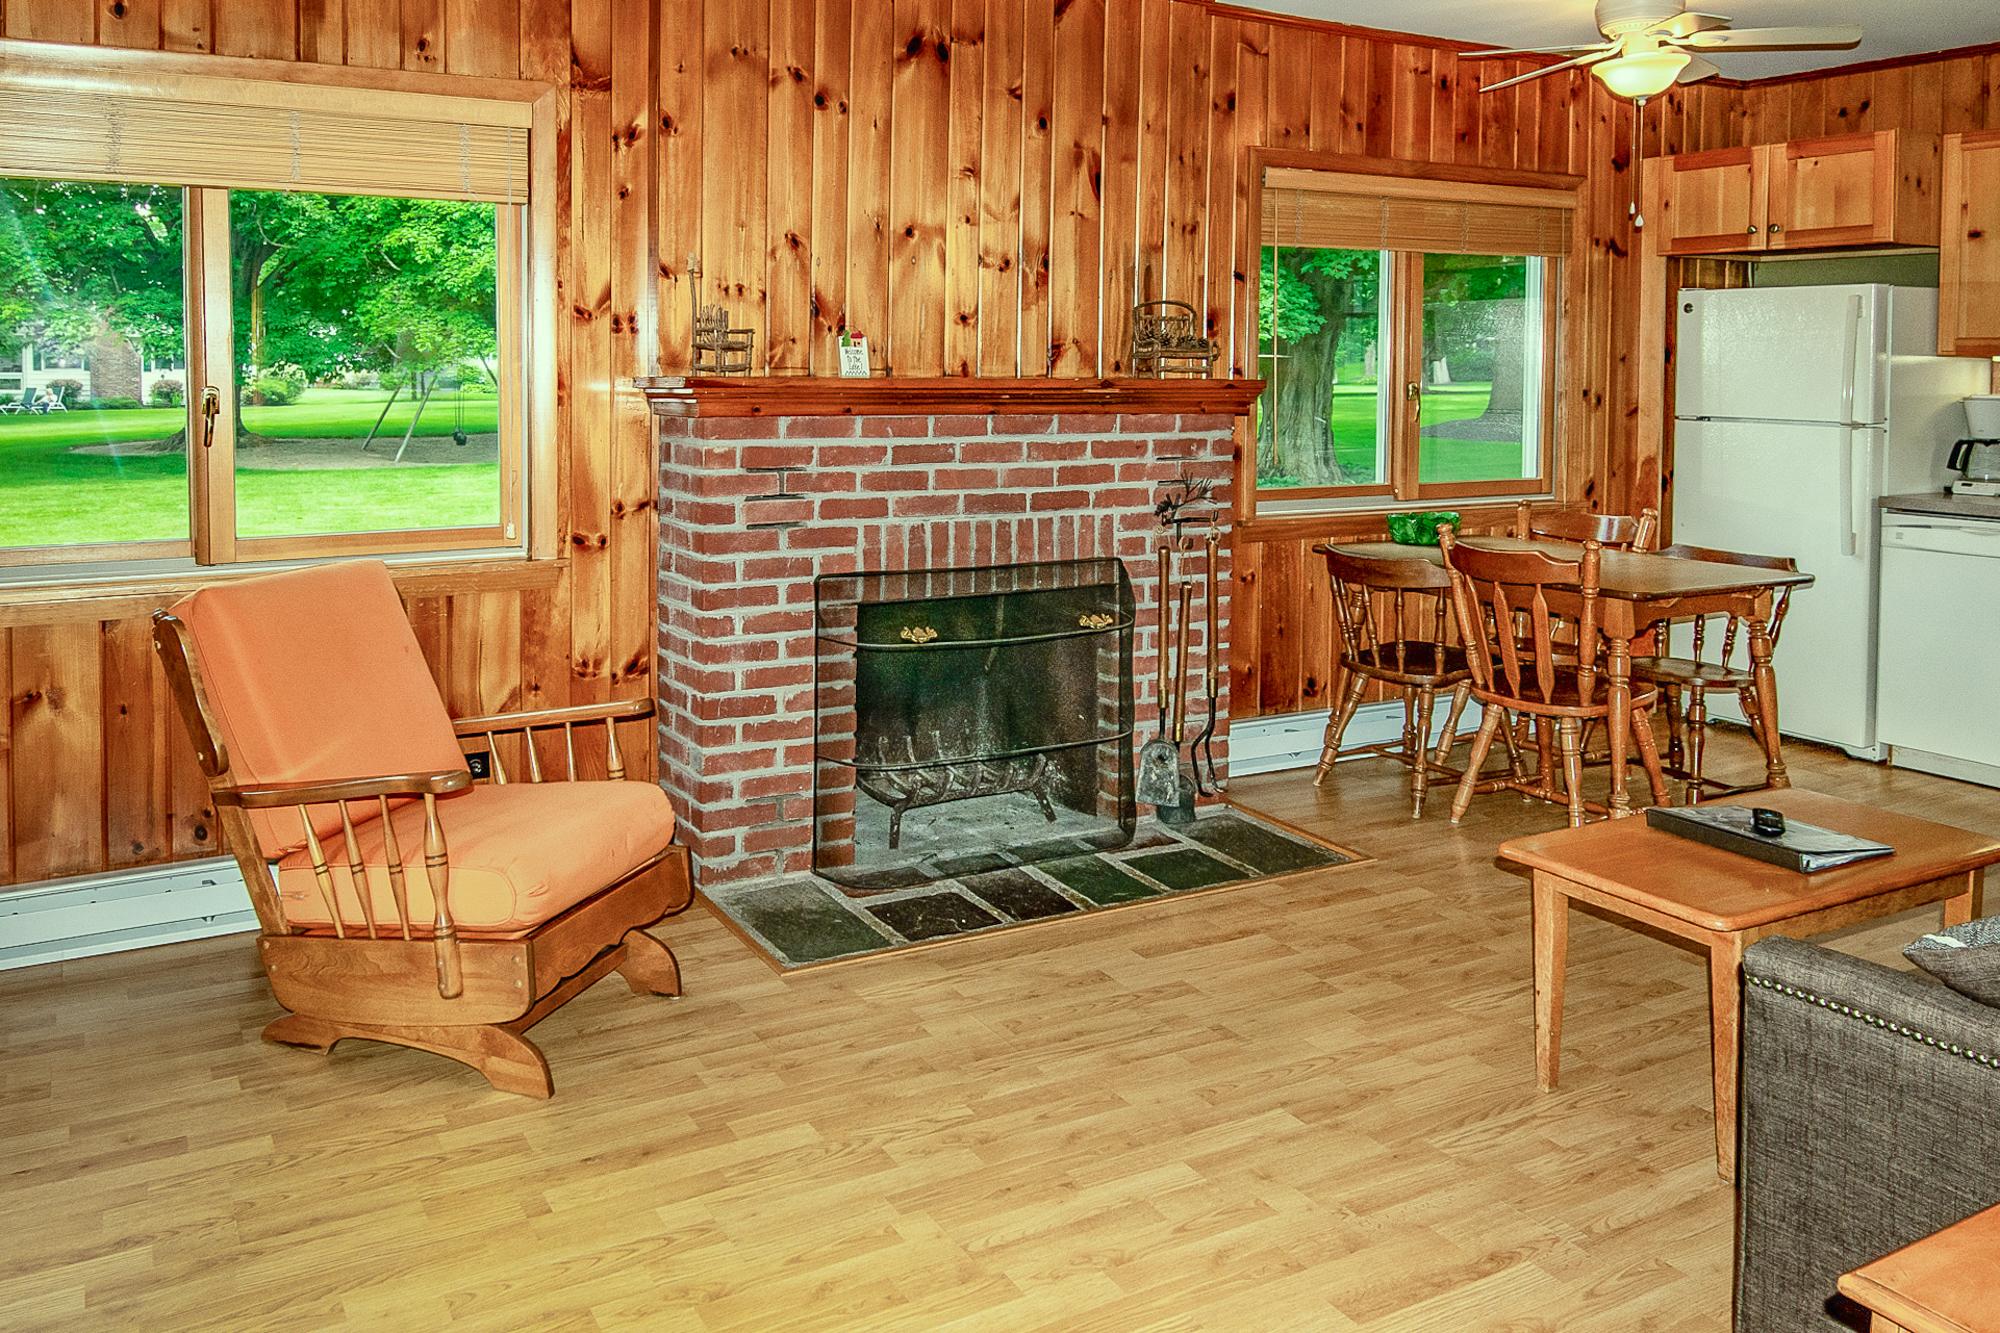 Takundewide Cottage #12 Livroom1Jul2019DSC_0407